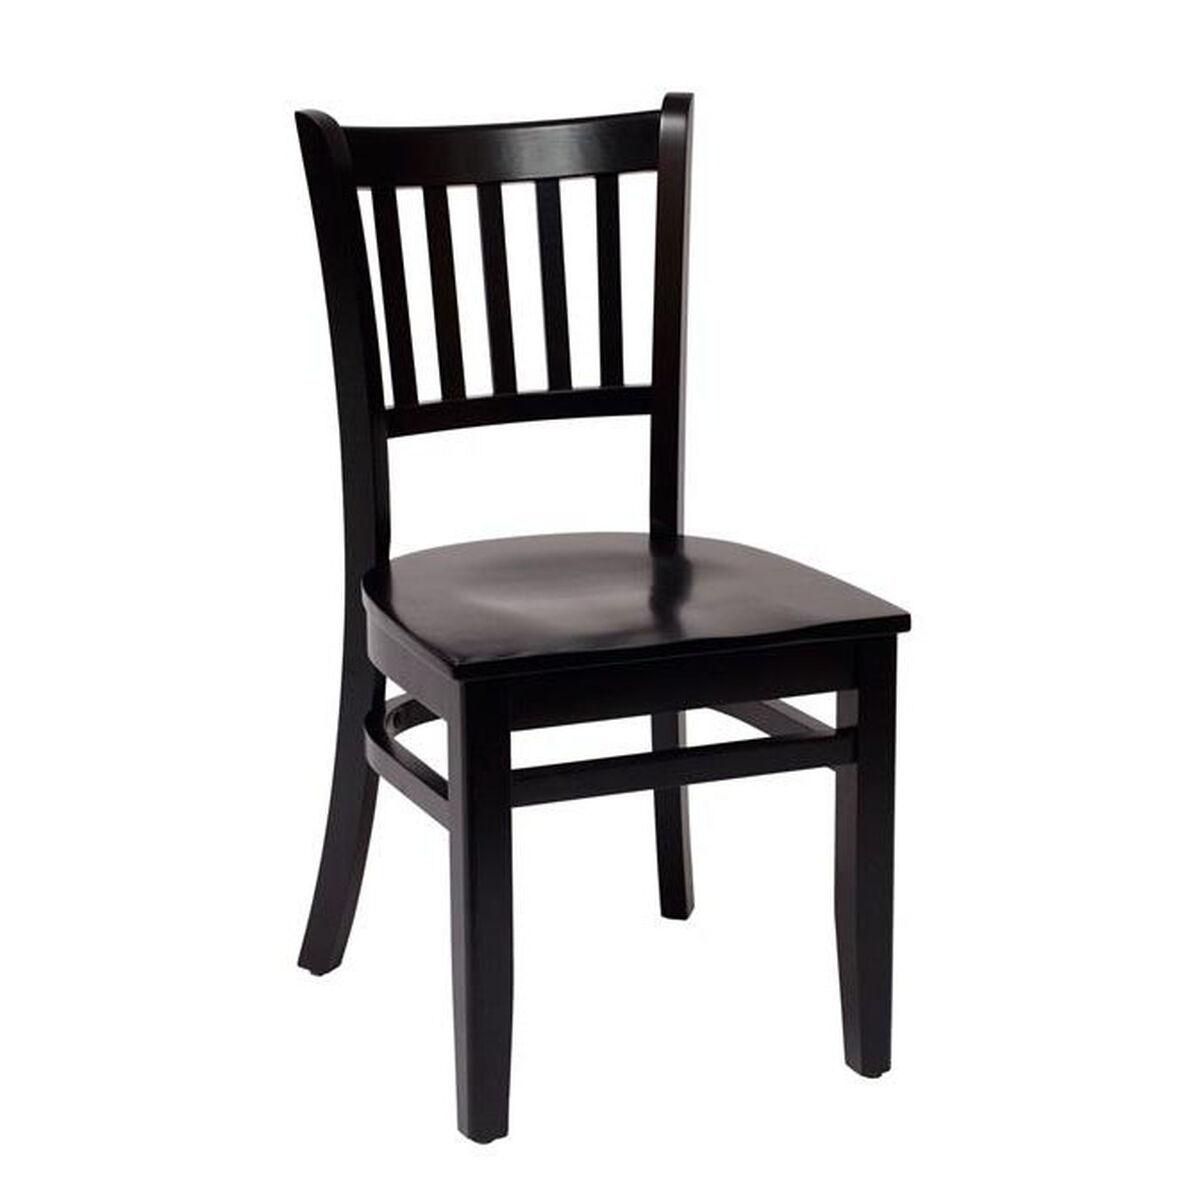 Delran Wood Slat Back Chair Lwc102blblw